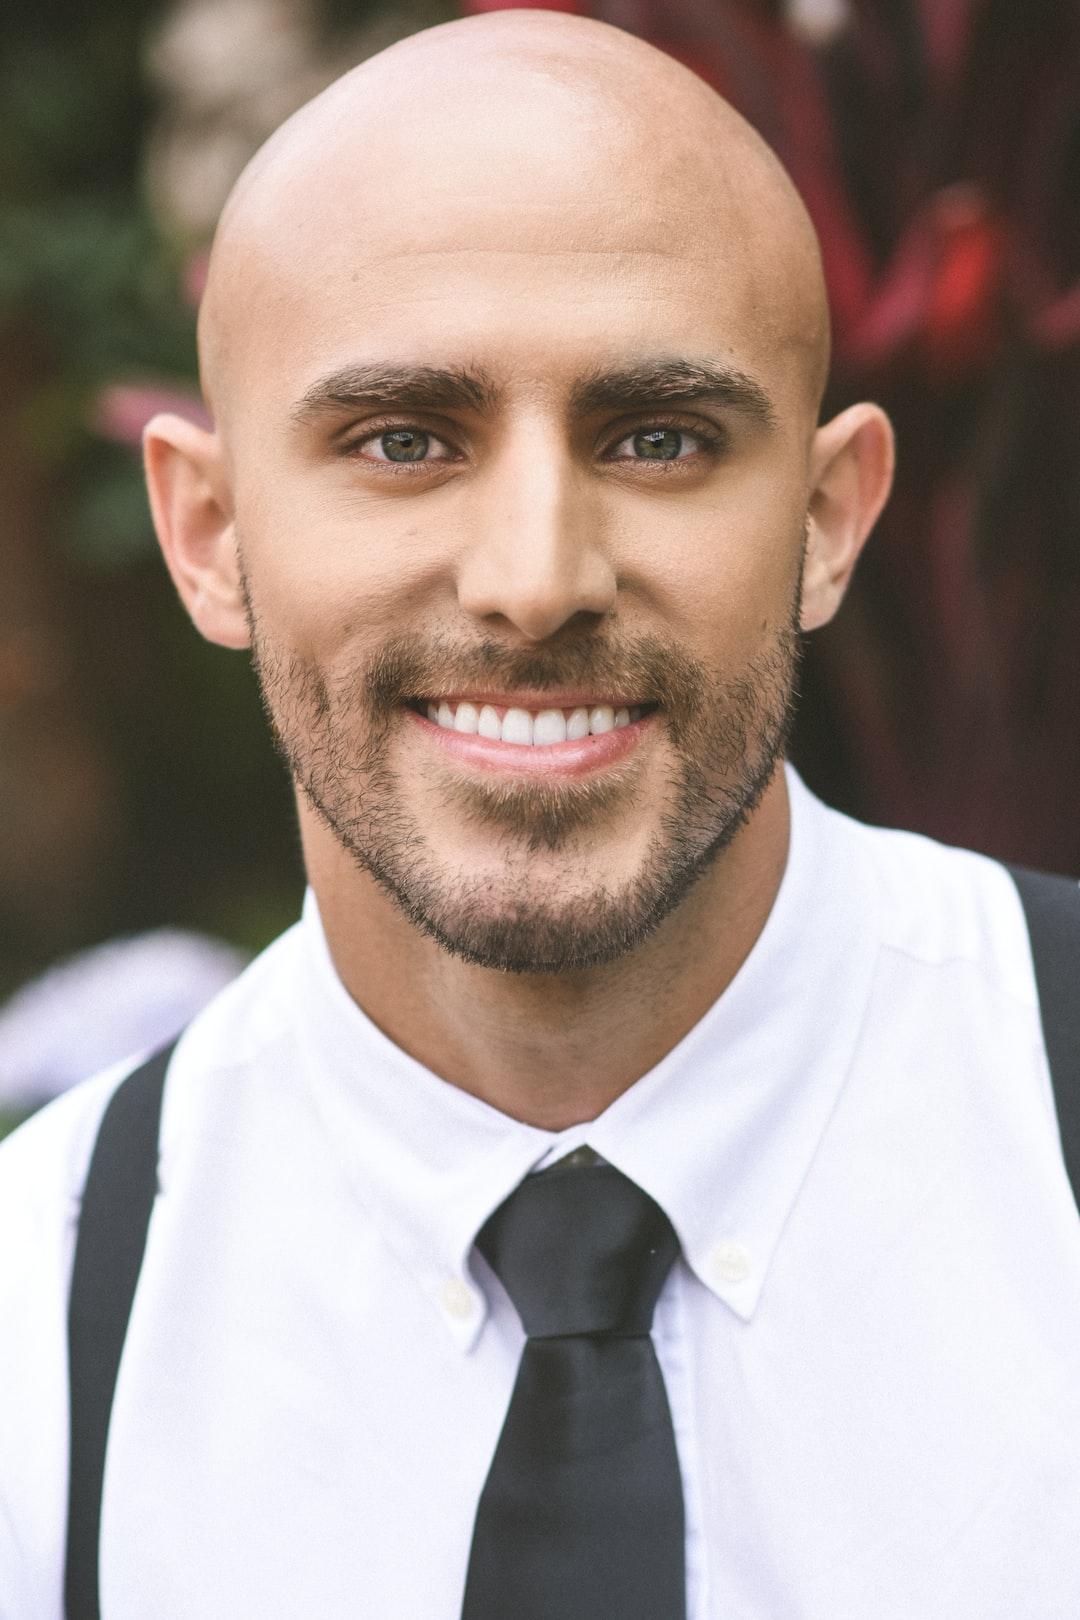 Male Model Actor Headshot